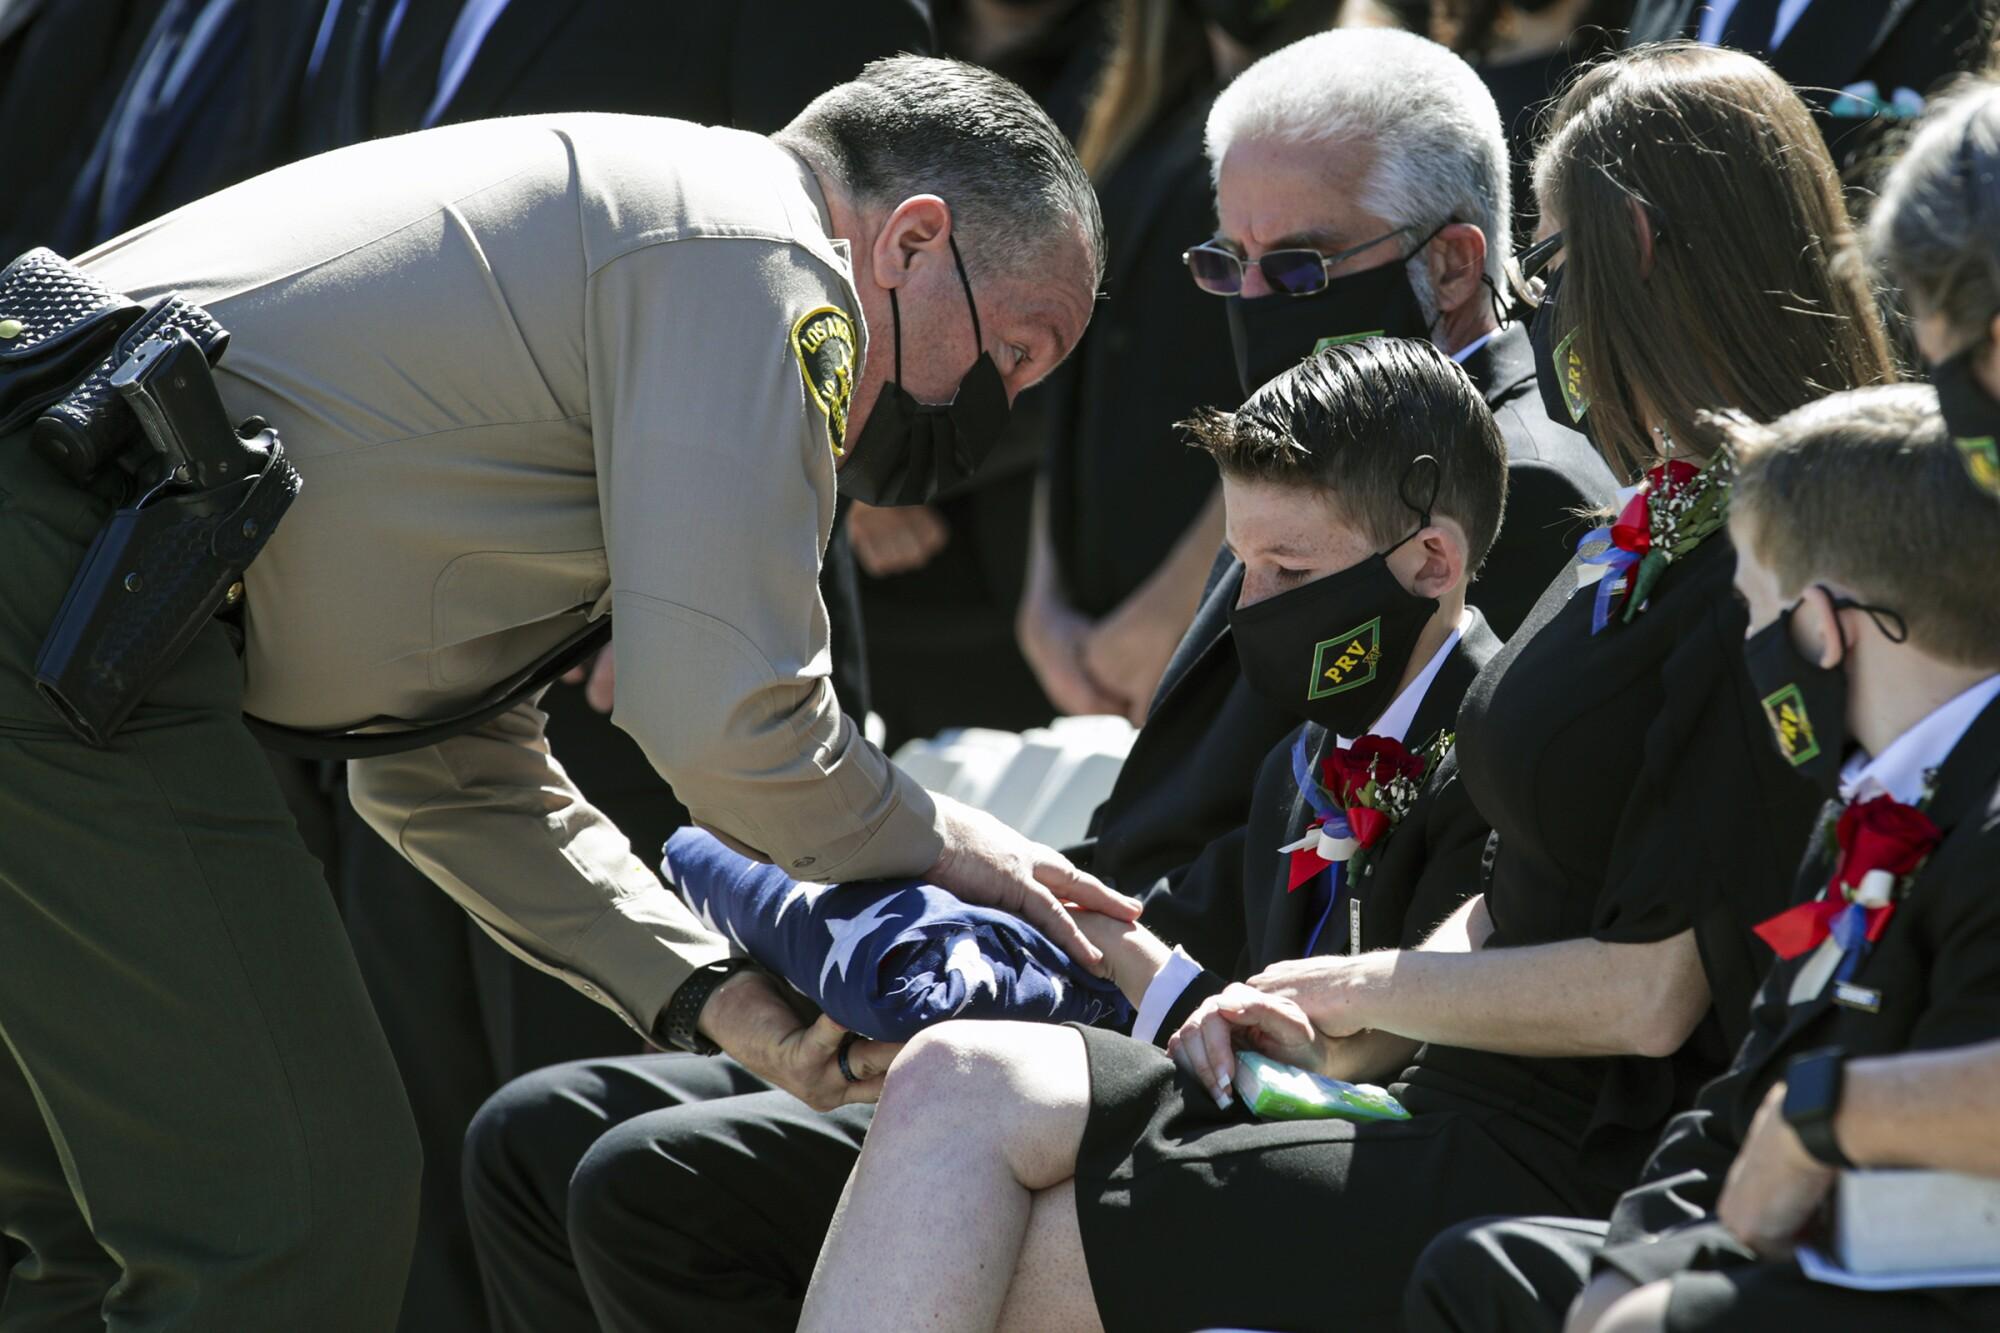 Los Angeles County Sheriff Alex Villanueva presents flag to Landen Albanese, the 11-year-old son of Deputy Thomas Albanese